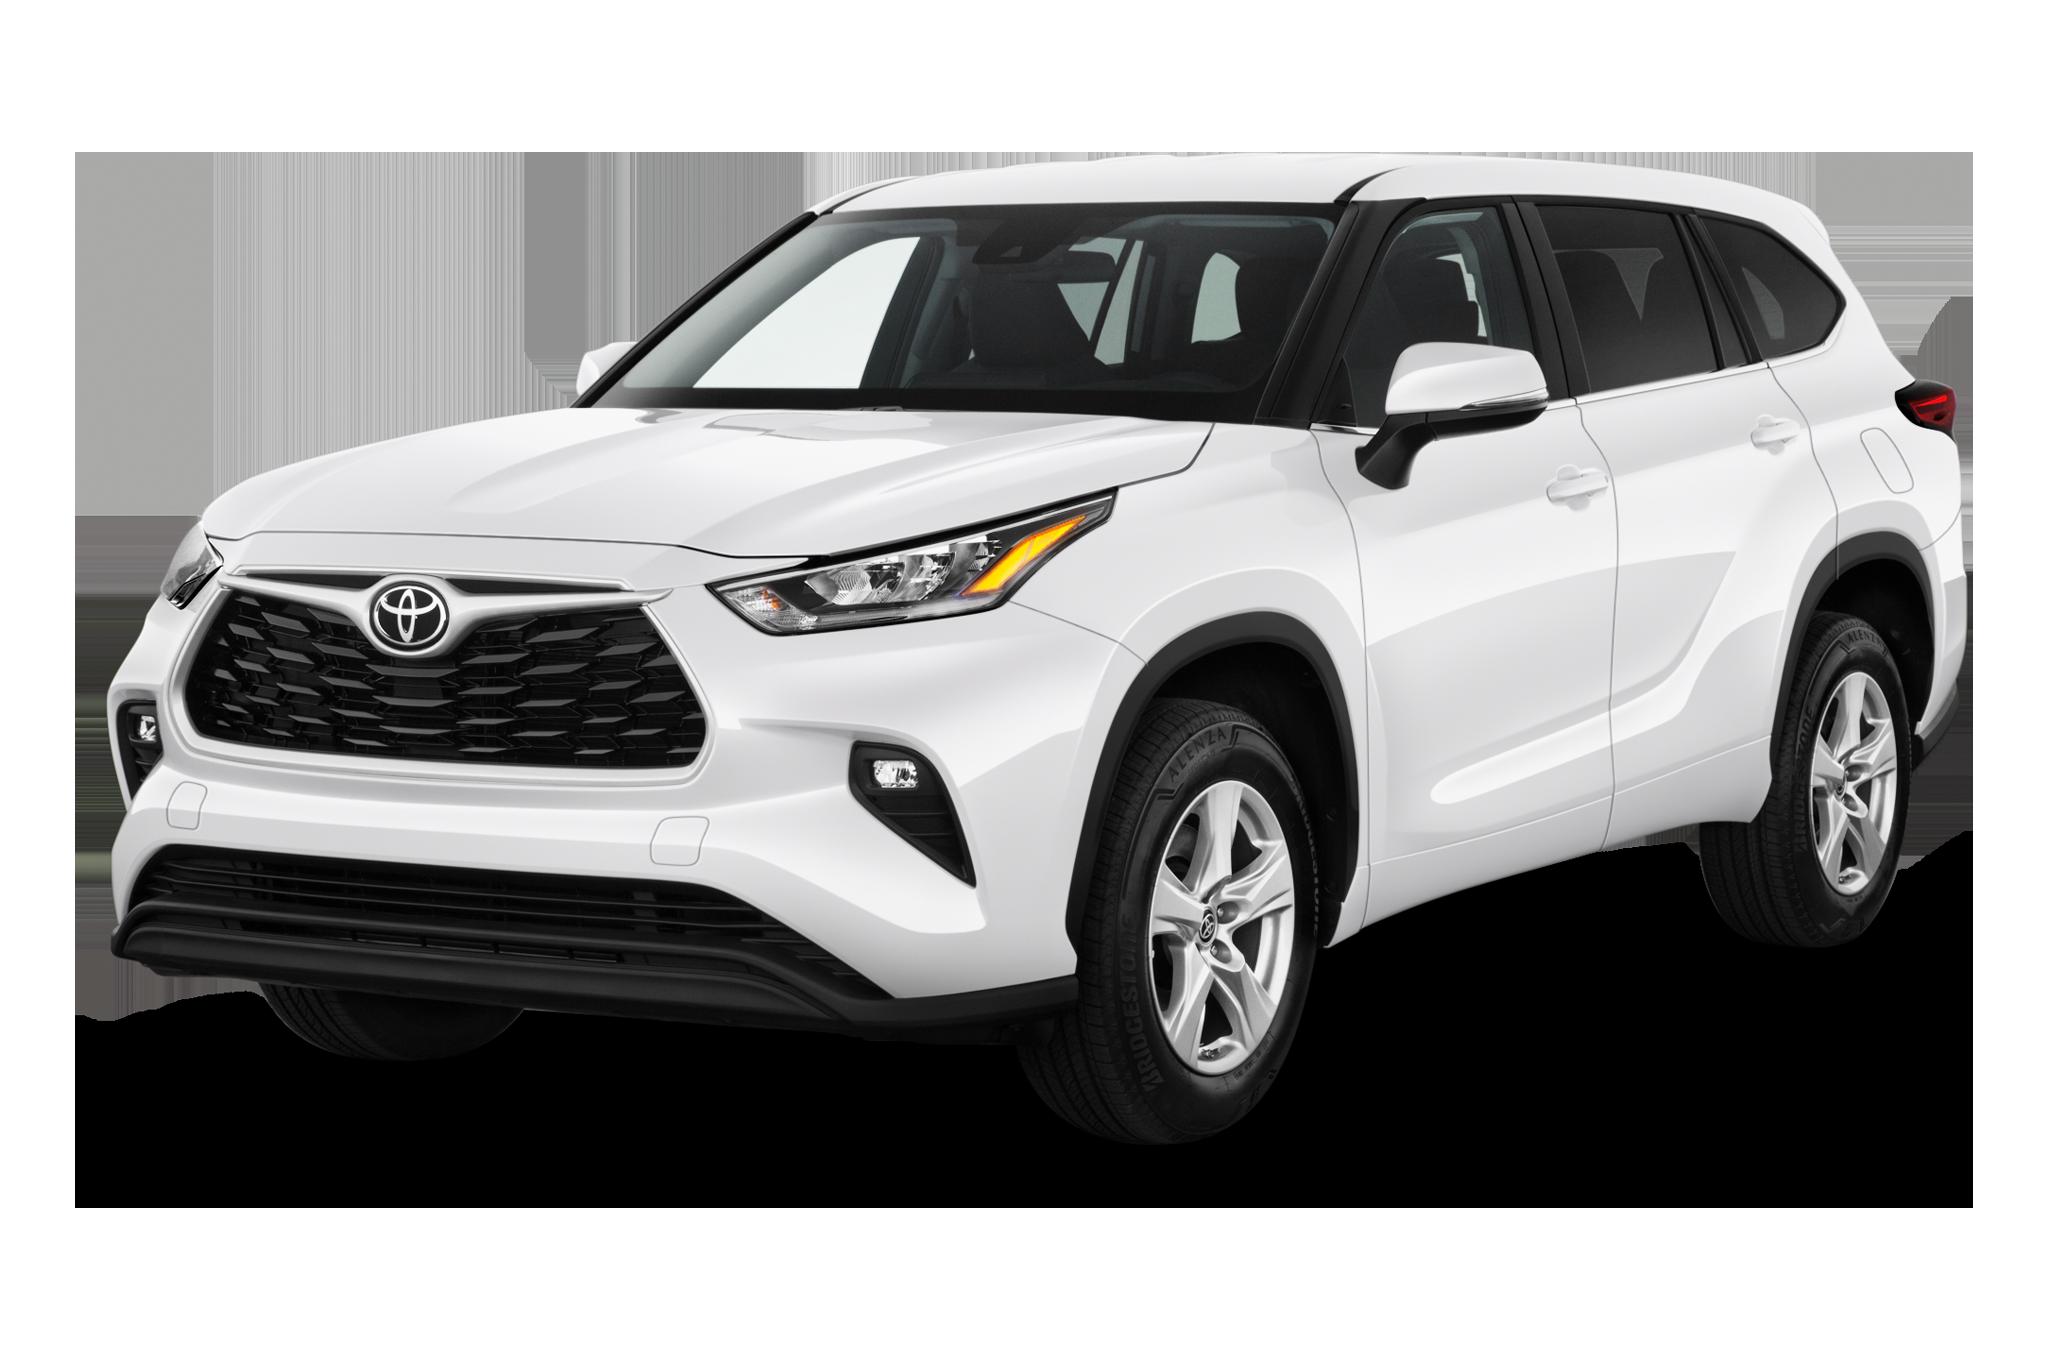 2020 Toyota Highlander Overview In 2020 Toyota Highlander Toyota Highlander